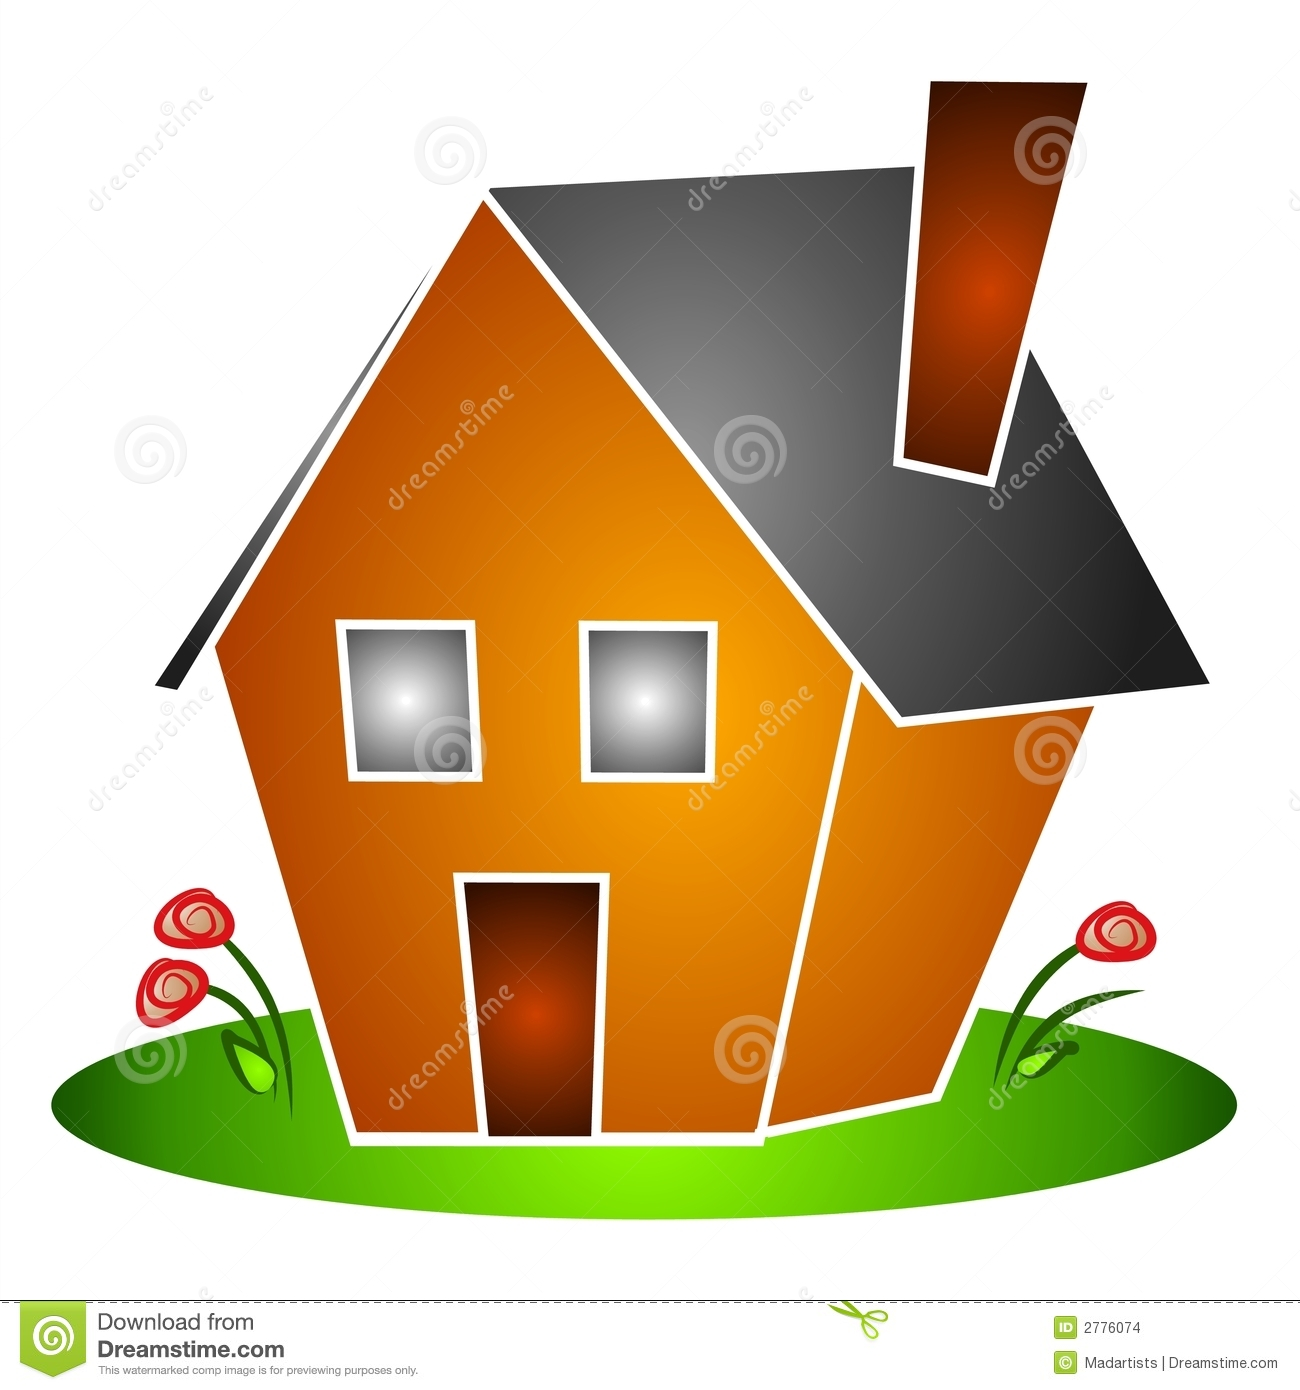 Clipart House. 23fb71b8c148bd36c0b9c0885-clipart house. 23fb71b8c148bd36c0b9c08857430d .-0